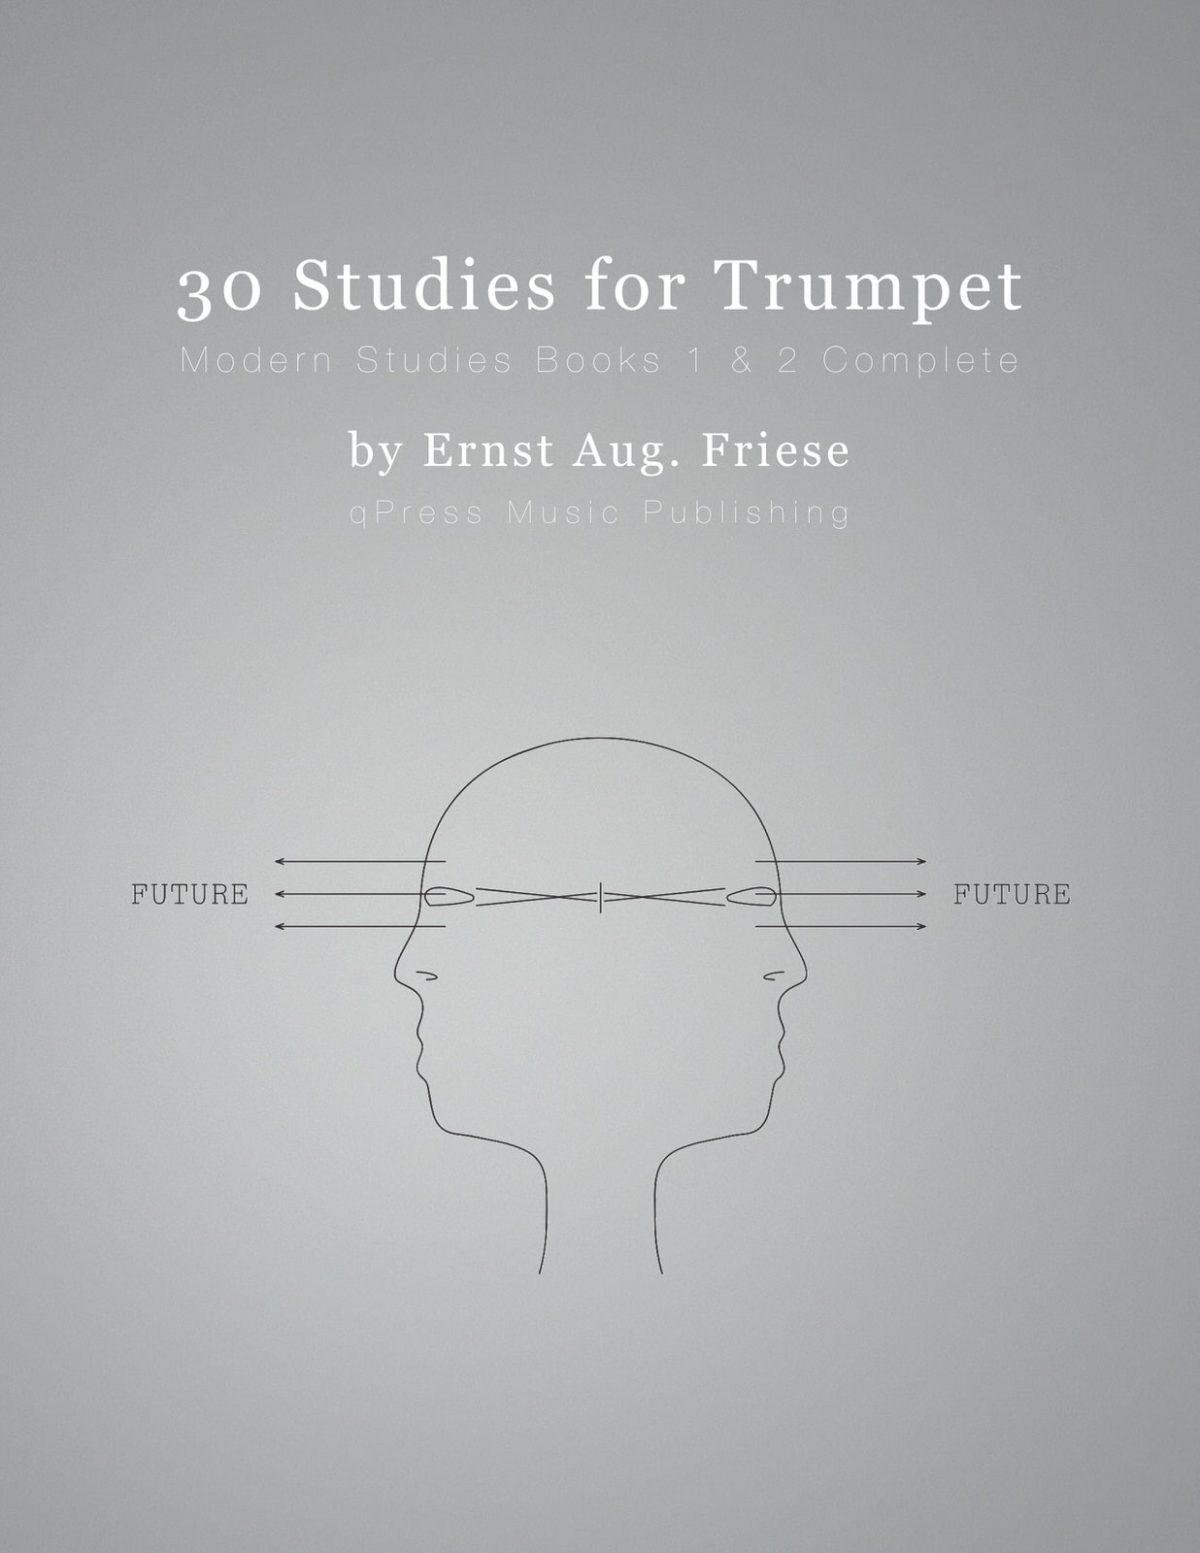 Friese, Modern Trumpet Studies Books 1 & 2 cover